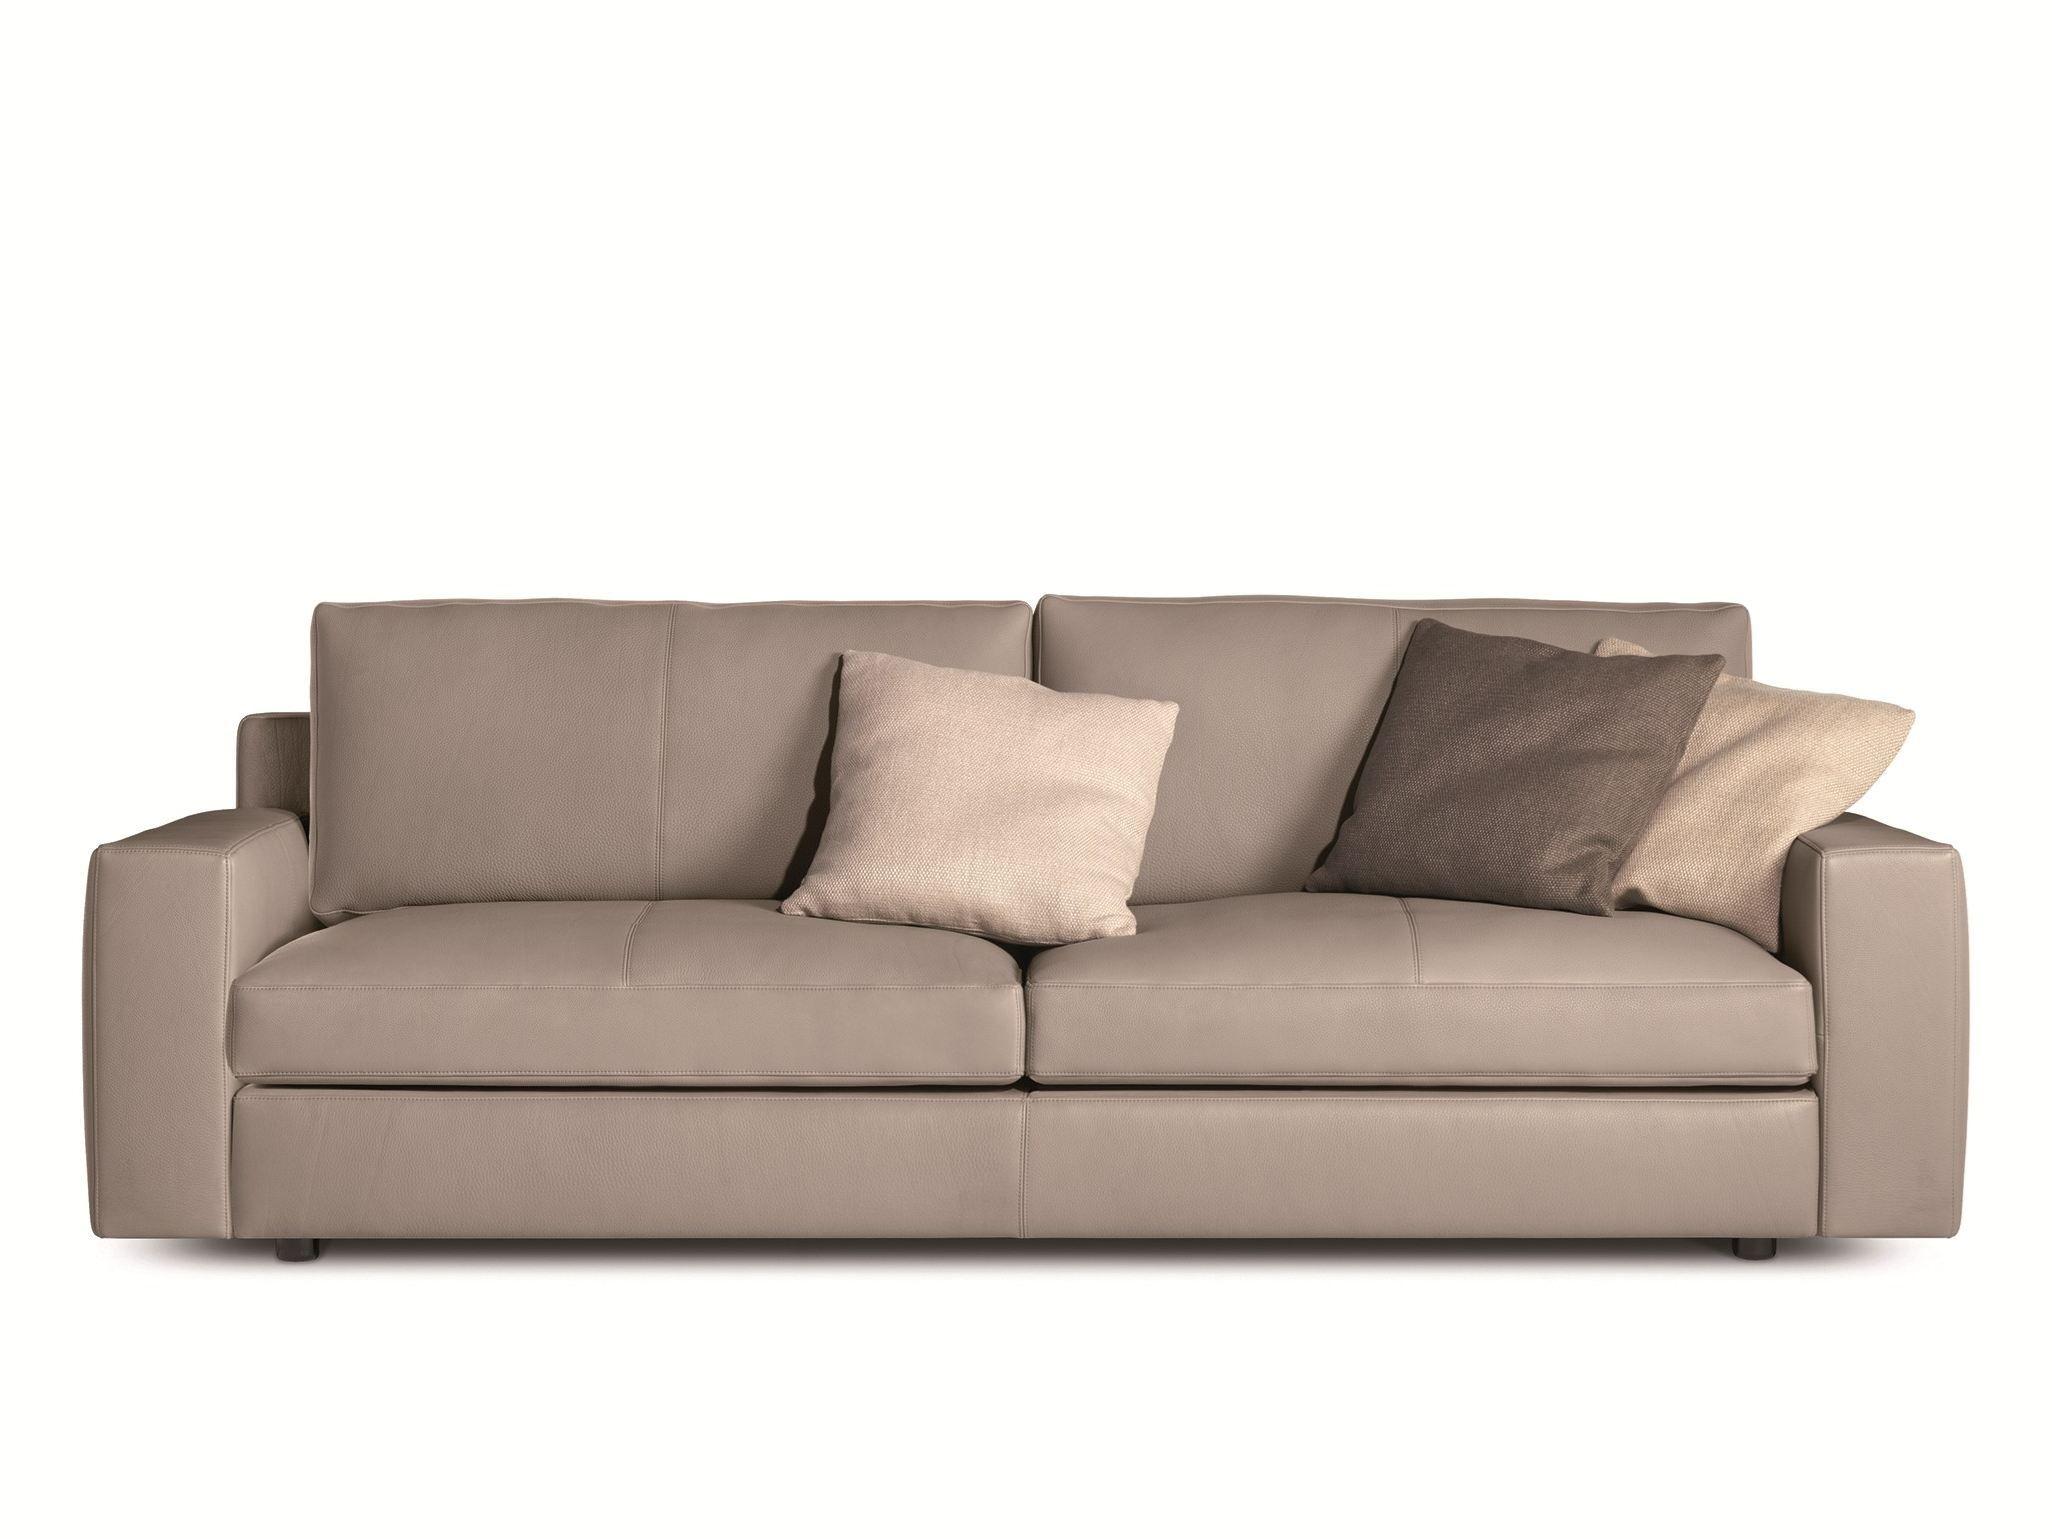 massimosistema divano a 2 posti by poltrona frau. Black Bedroom Furniture Sets. Home Design Ideas